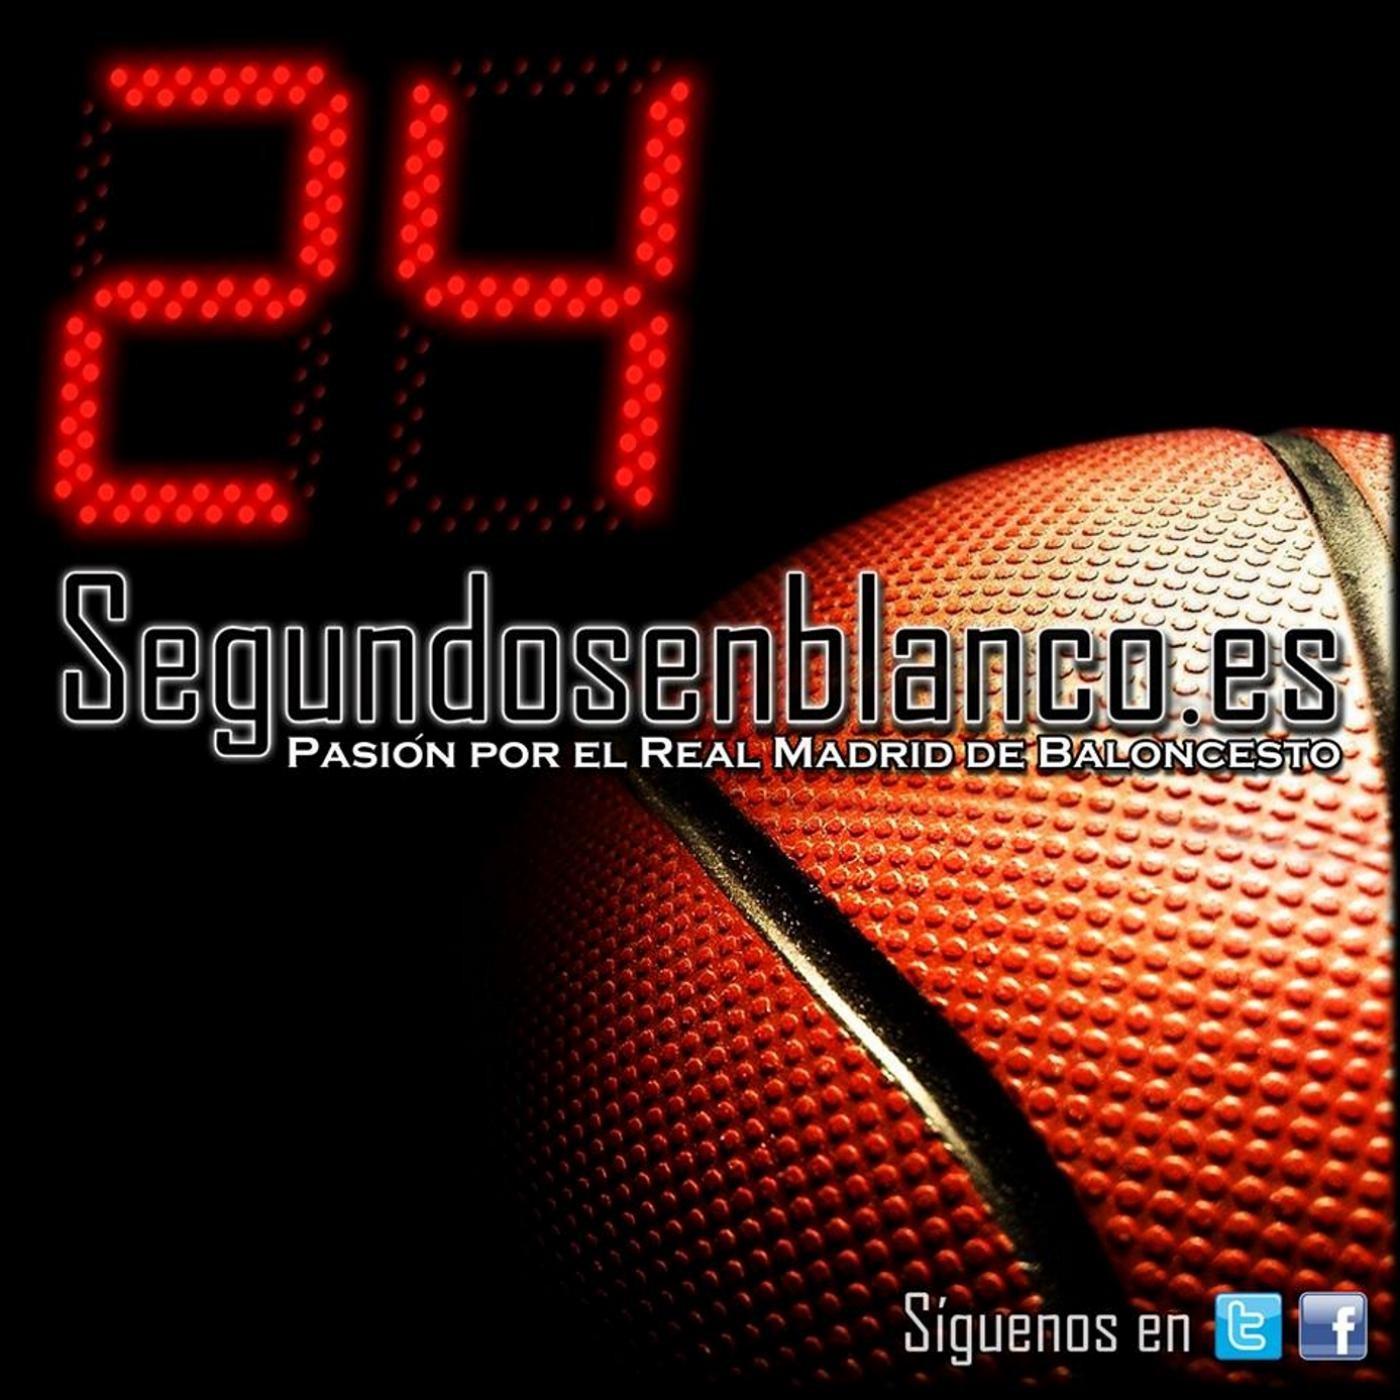 Podcast 24segundosenblanco 2x24 Scariolo sustituye a Scariolo